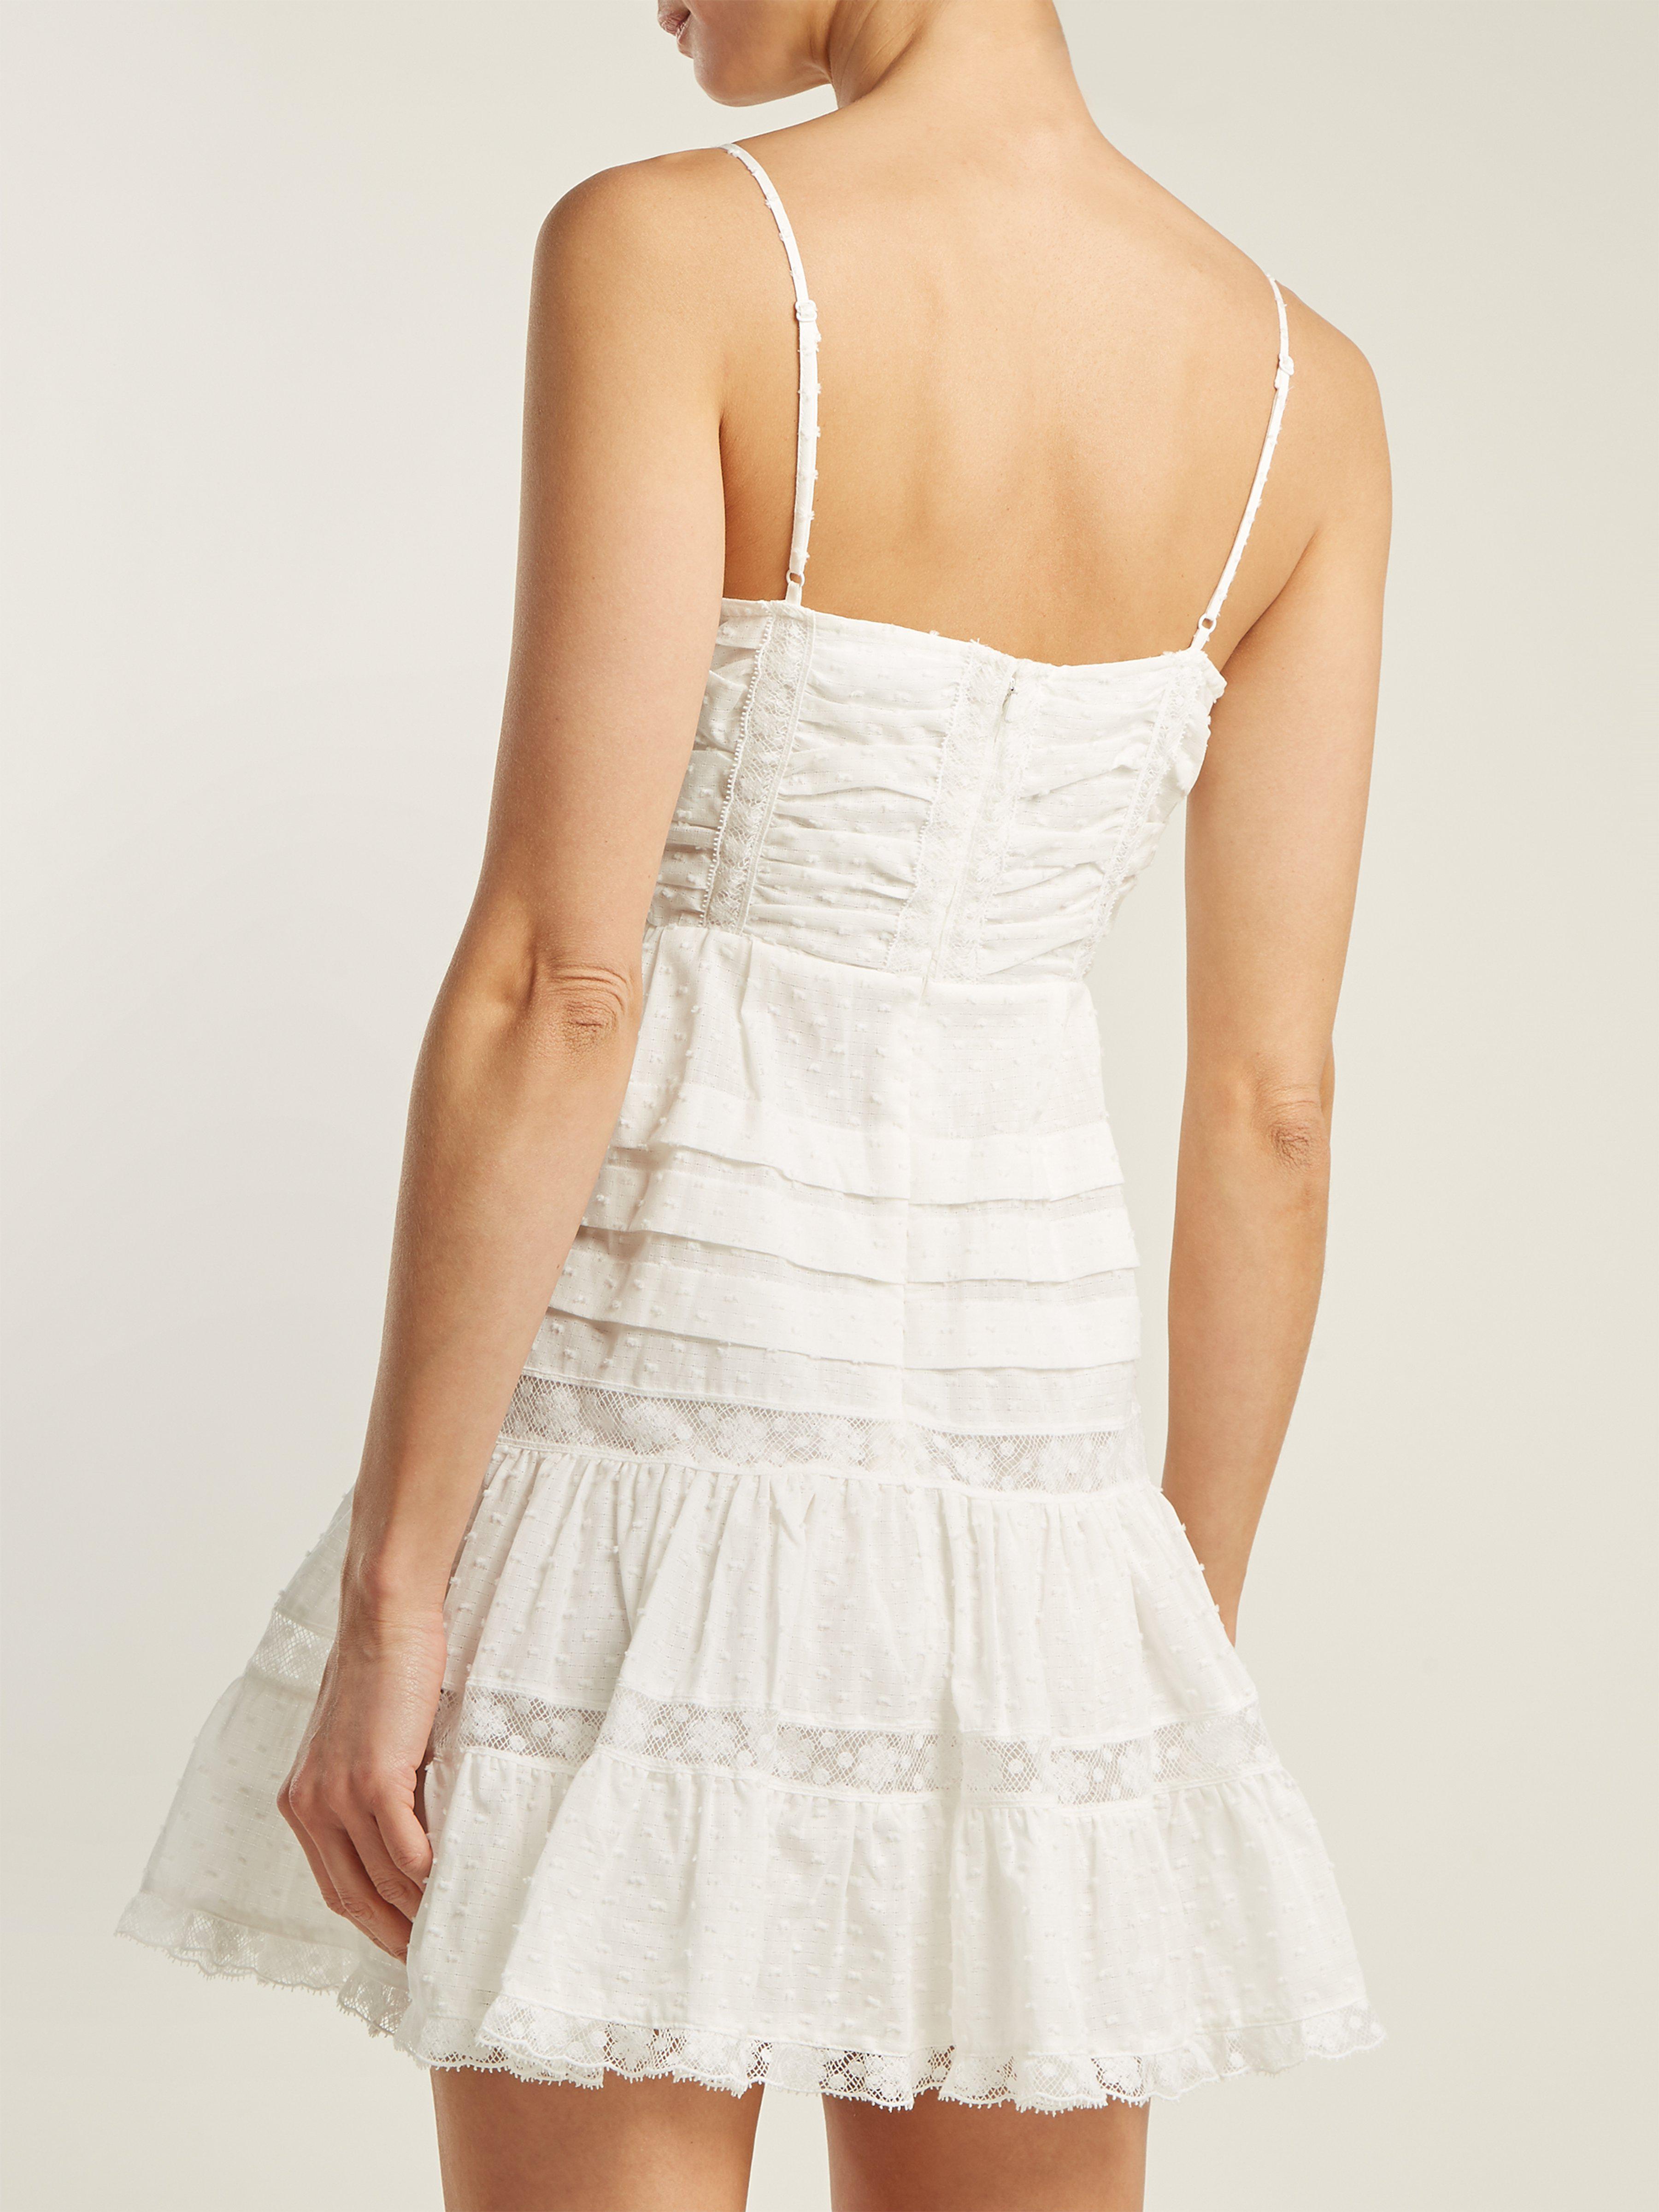 d97e41214bd Zimmermann - White Iris Lace Insert Camisole Dress - Lyst. View fullscreen